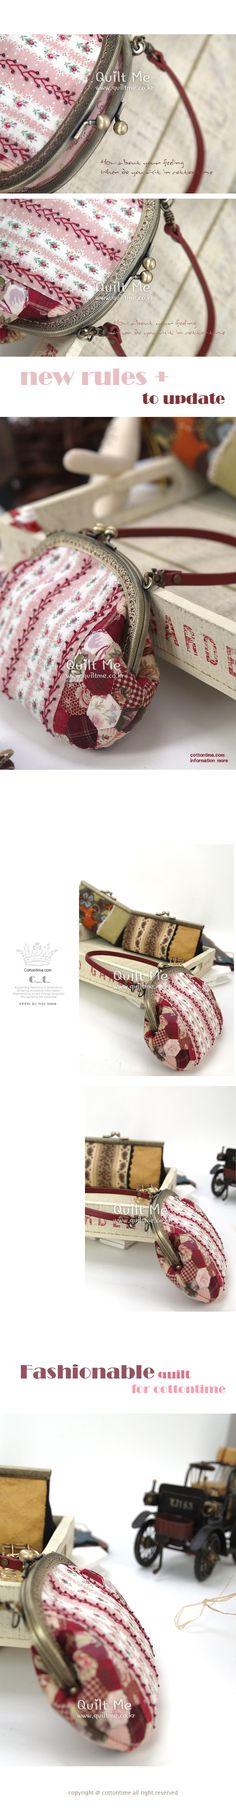 http://www.quiltme.co.kr/shop/shopdetail.html?branduid=11706